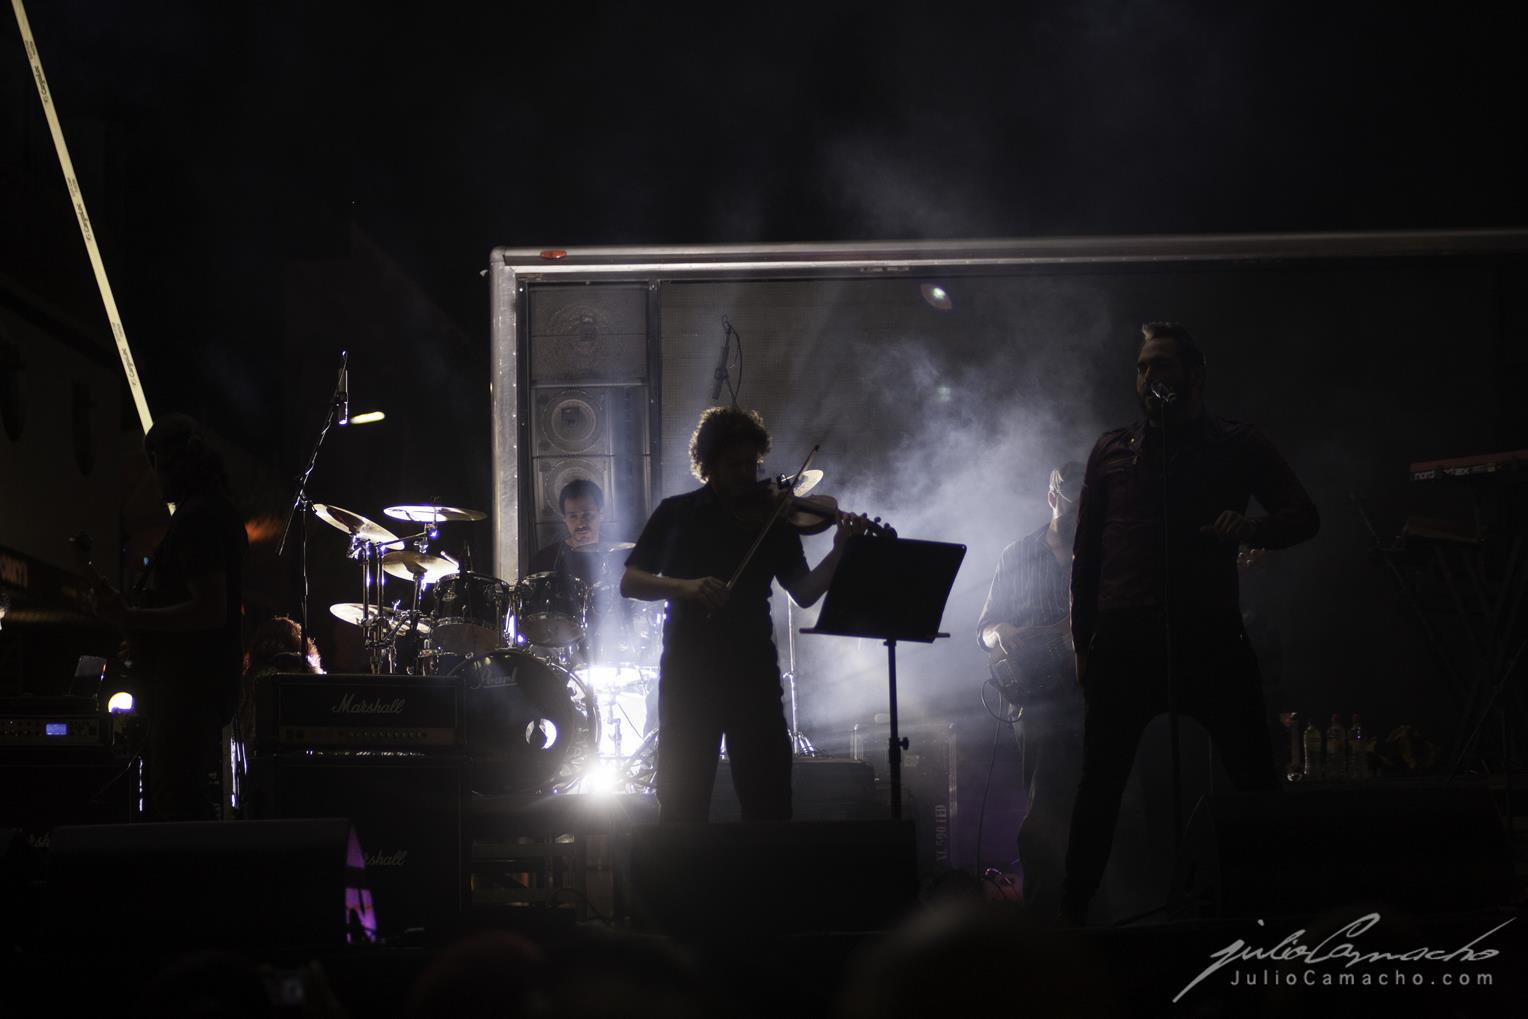 2014-10-30 31 CAST TOUR Ensenada y Tijuana - 1390 - www.Juli (Copy).jpg